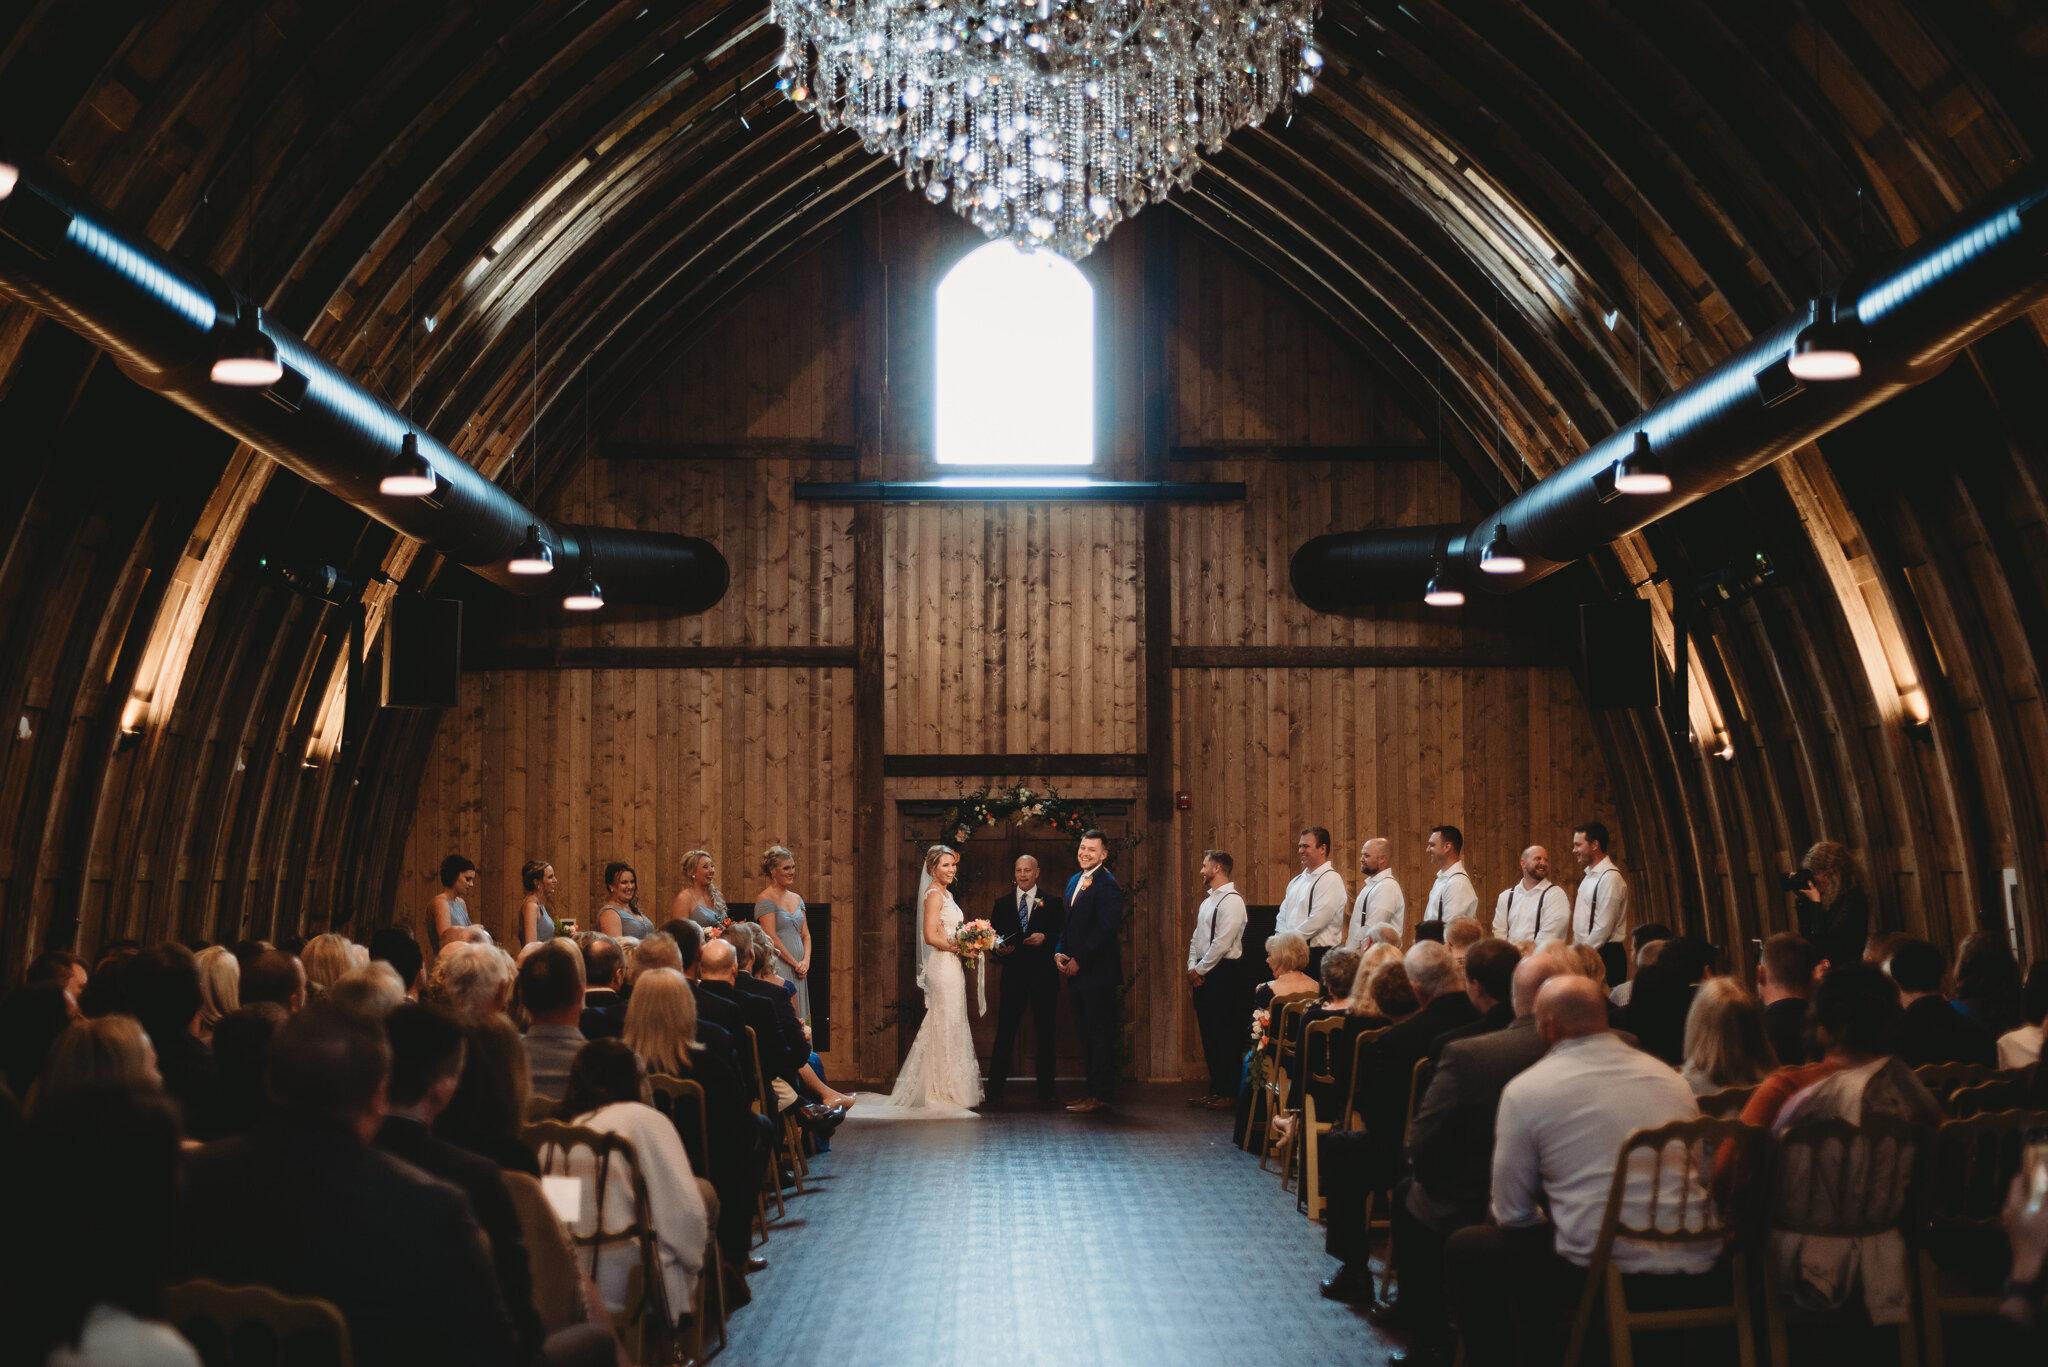 Vennebu Hill Weddings & Events Venue - Tara Draper Photography